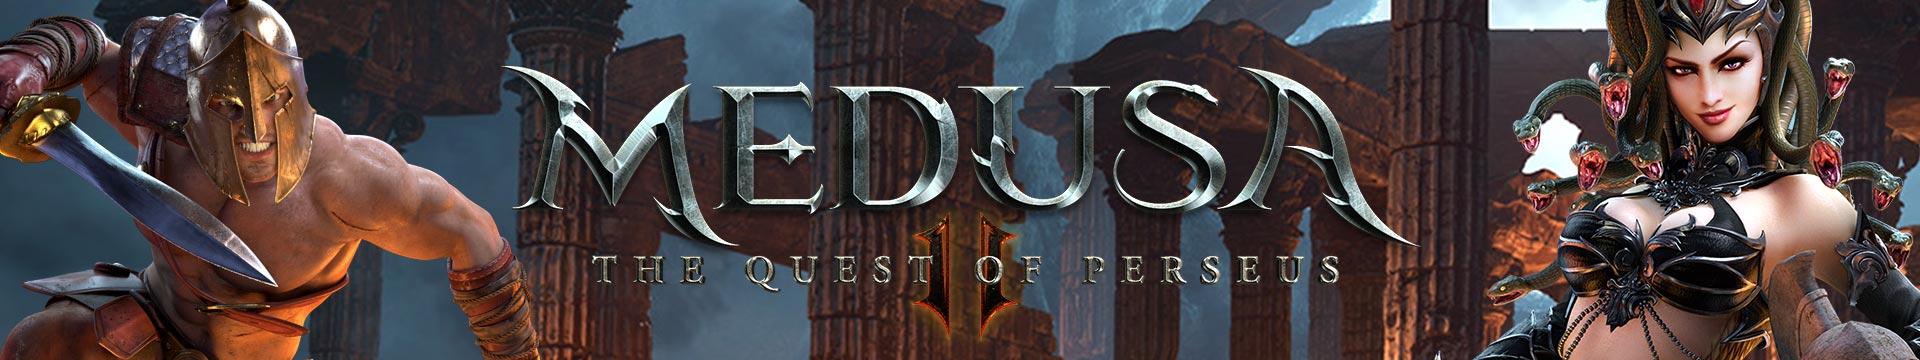 Medusa_Perseus